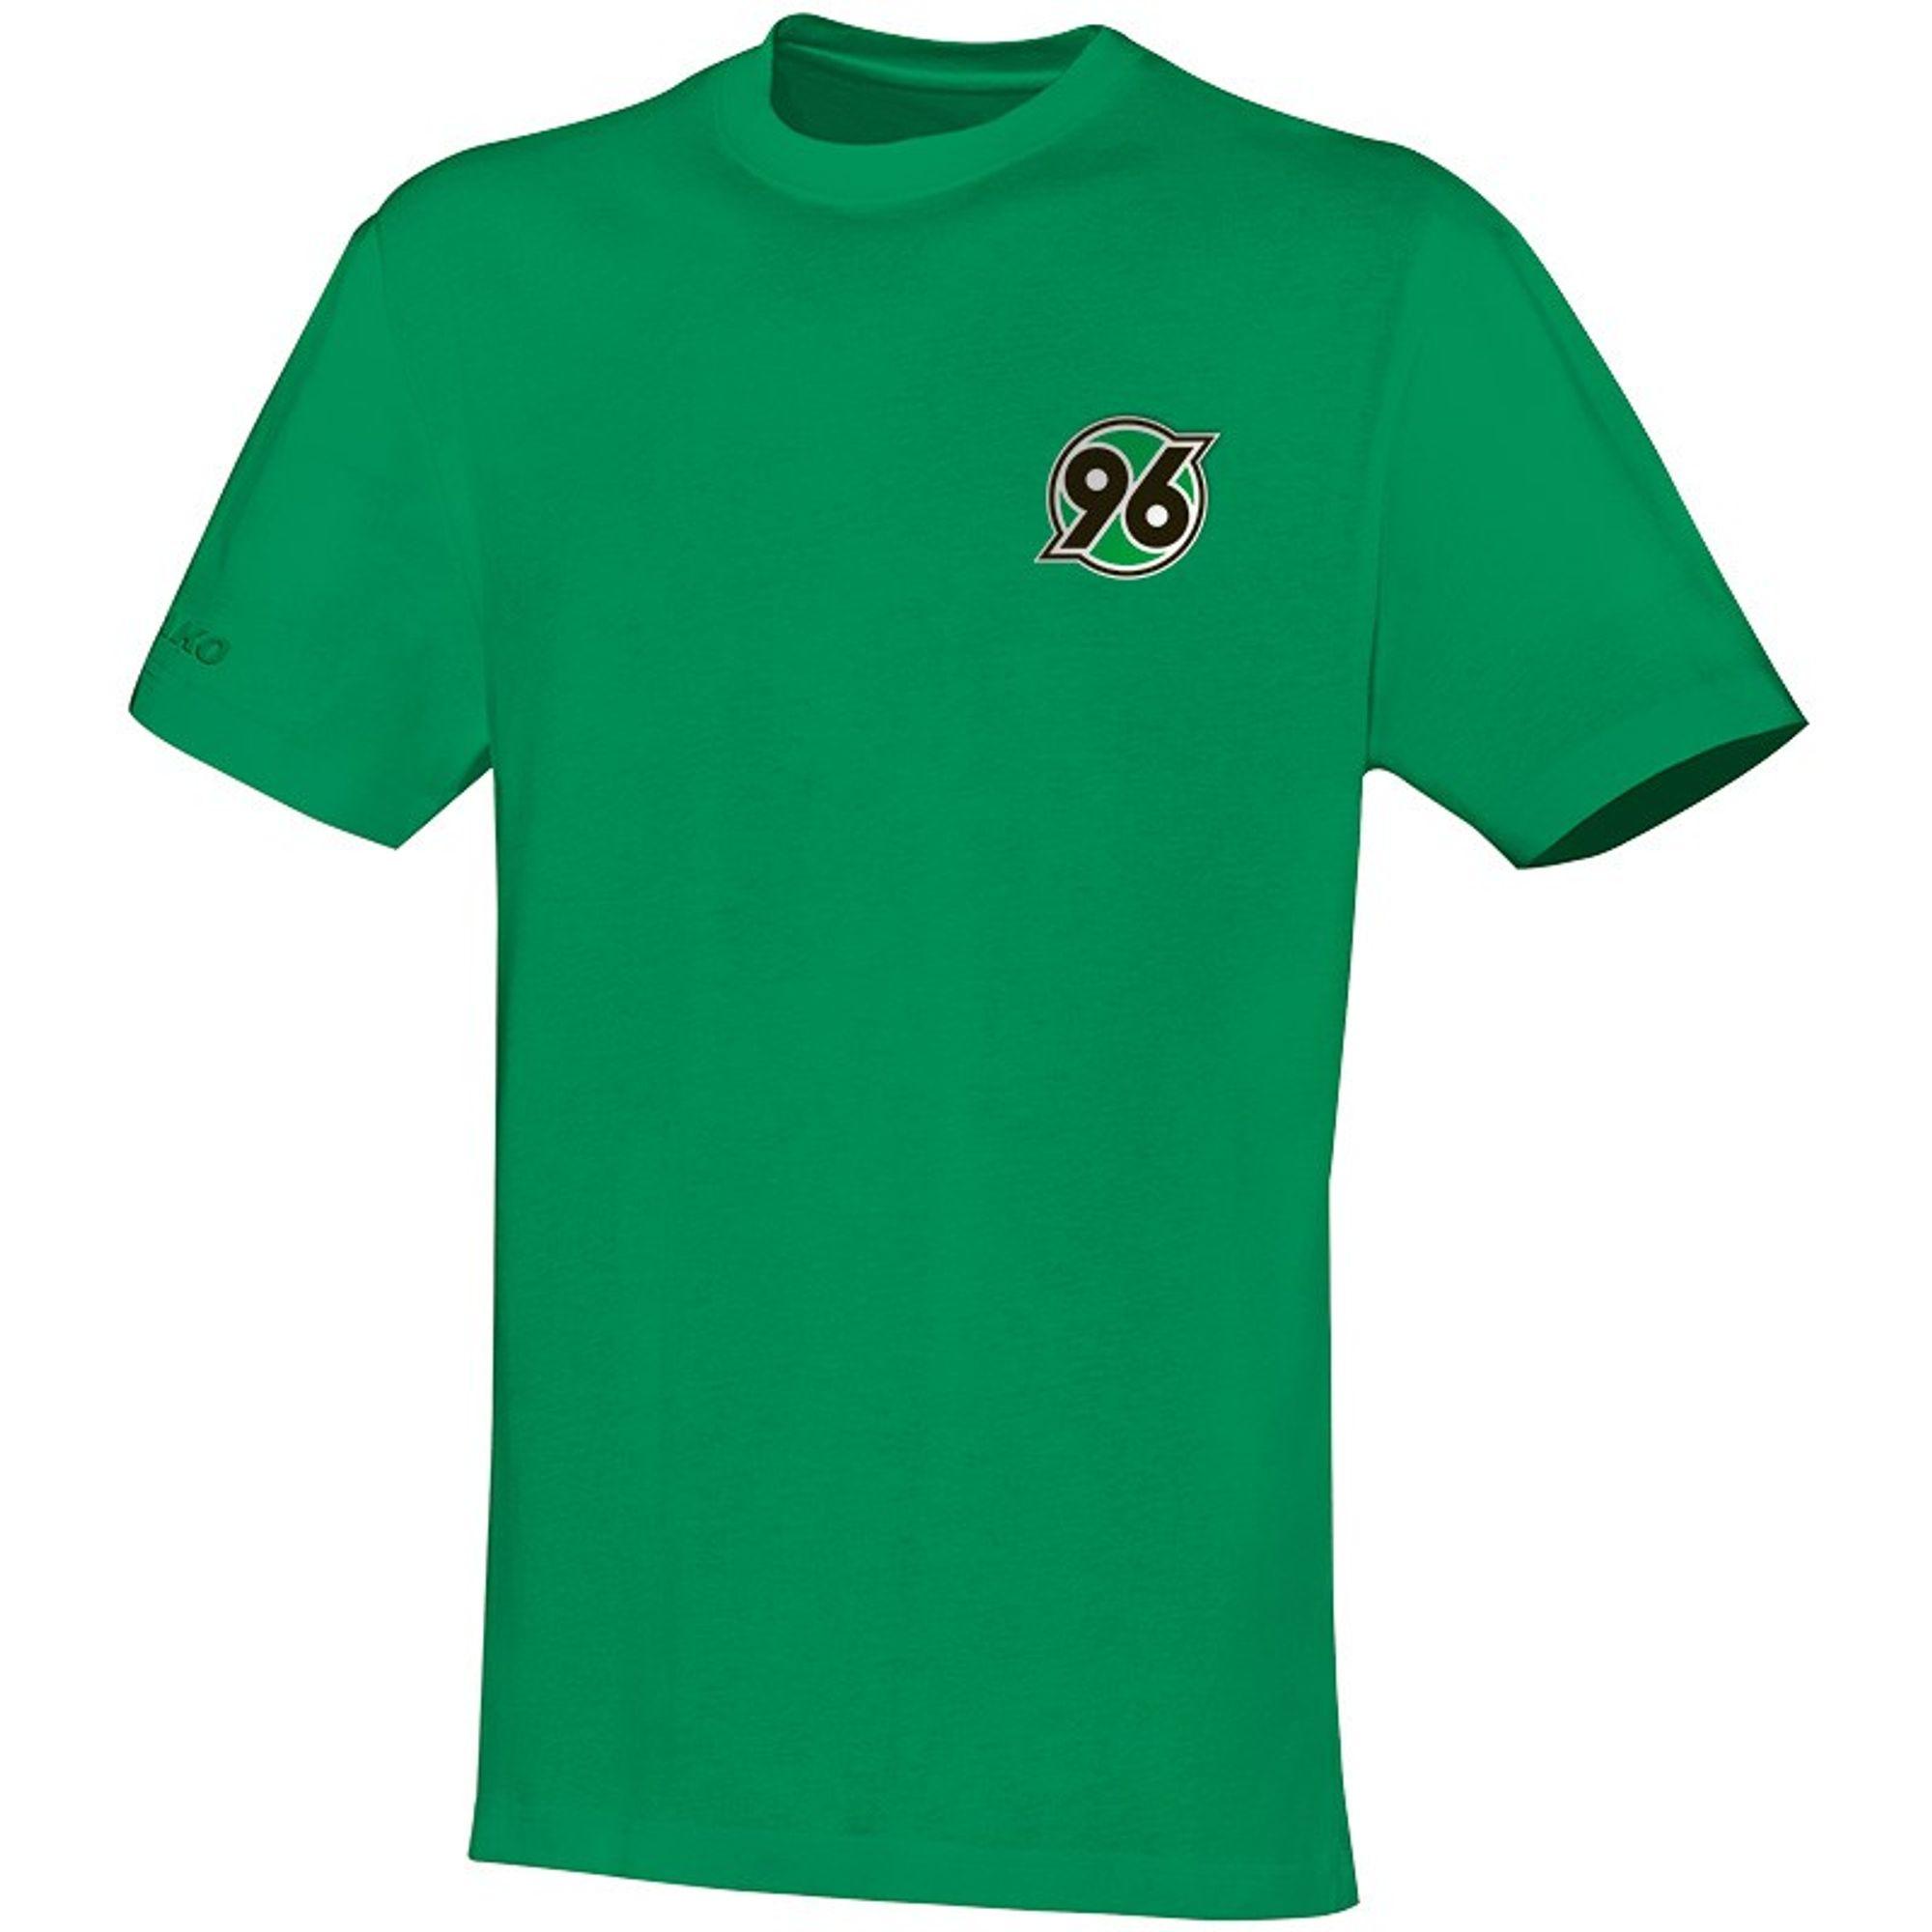 Jako Hannover 96 T-Shirt Team - sportgrün